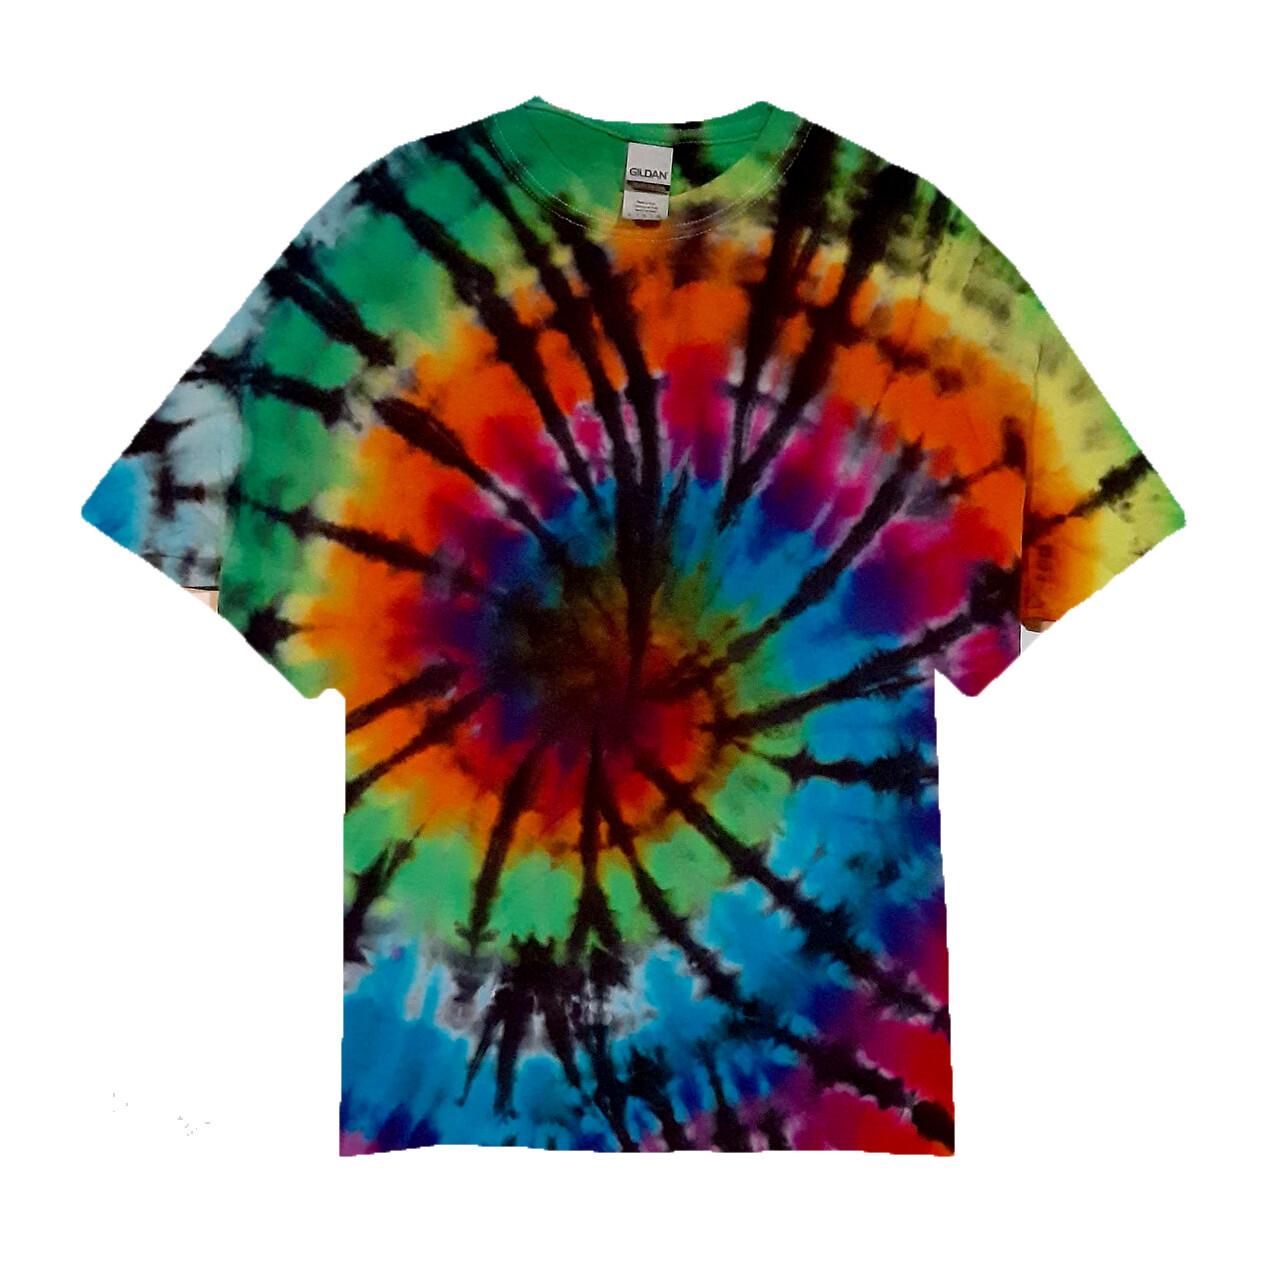 Traditional Rainbow Spiral Tie-Dye